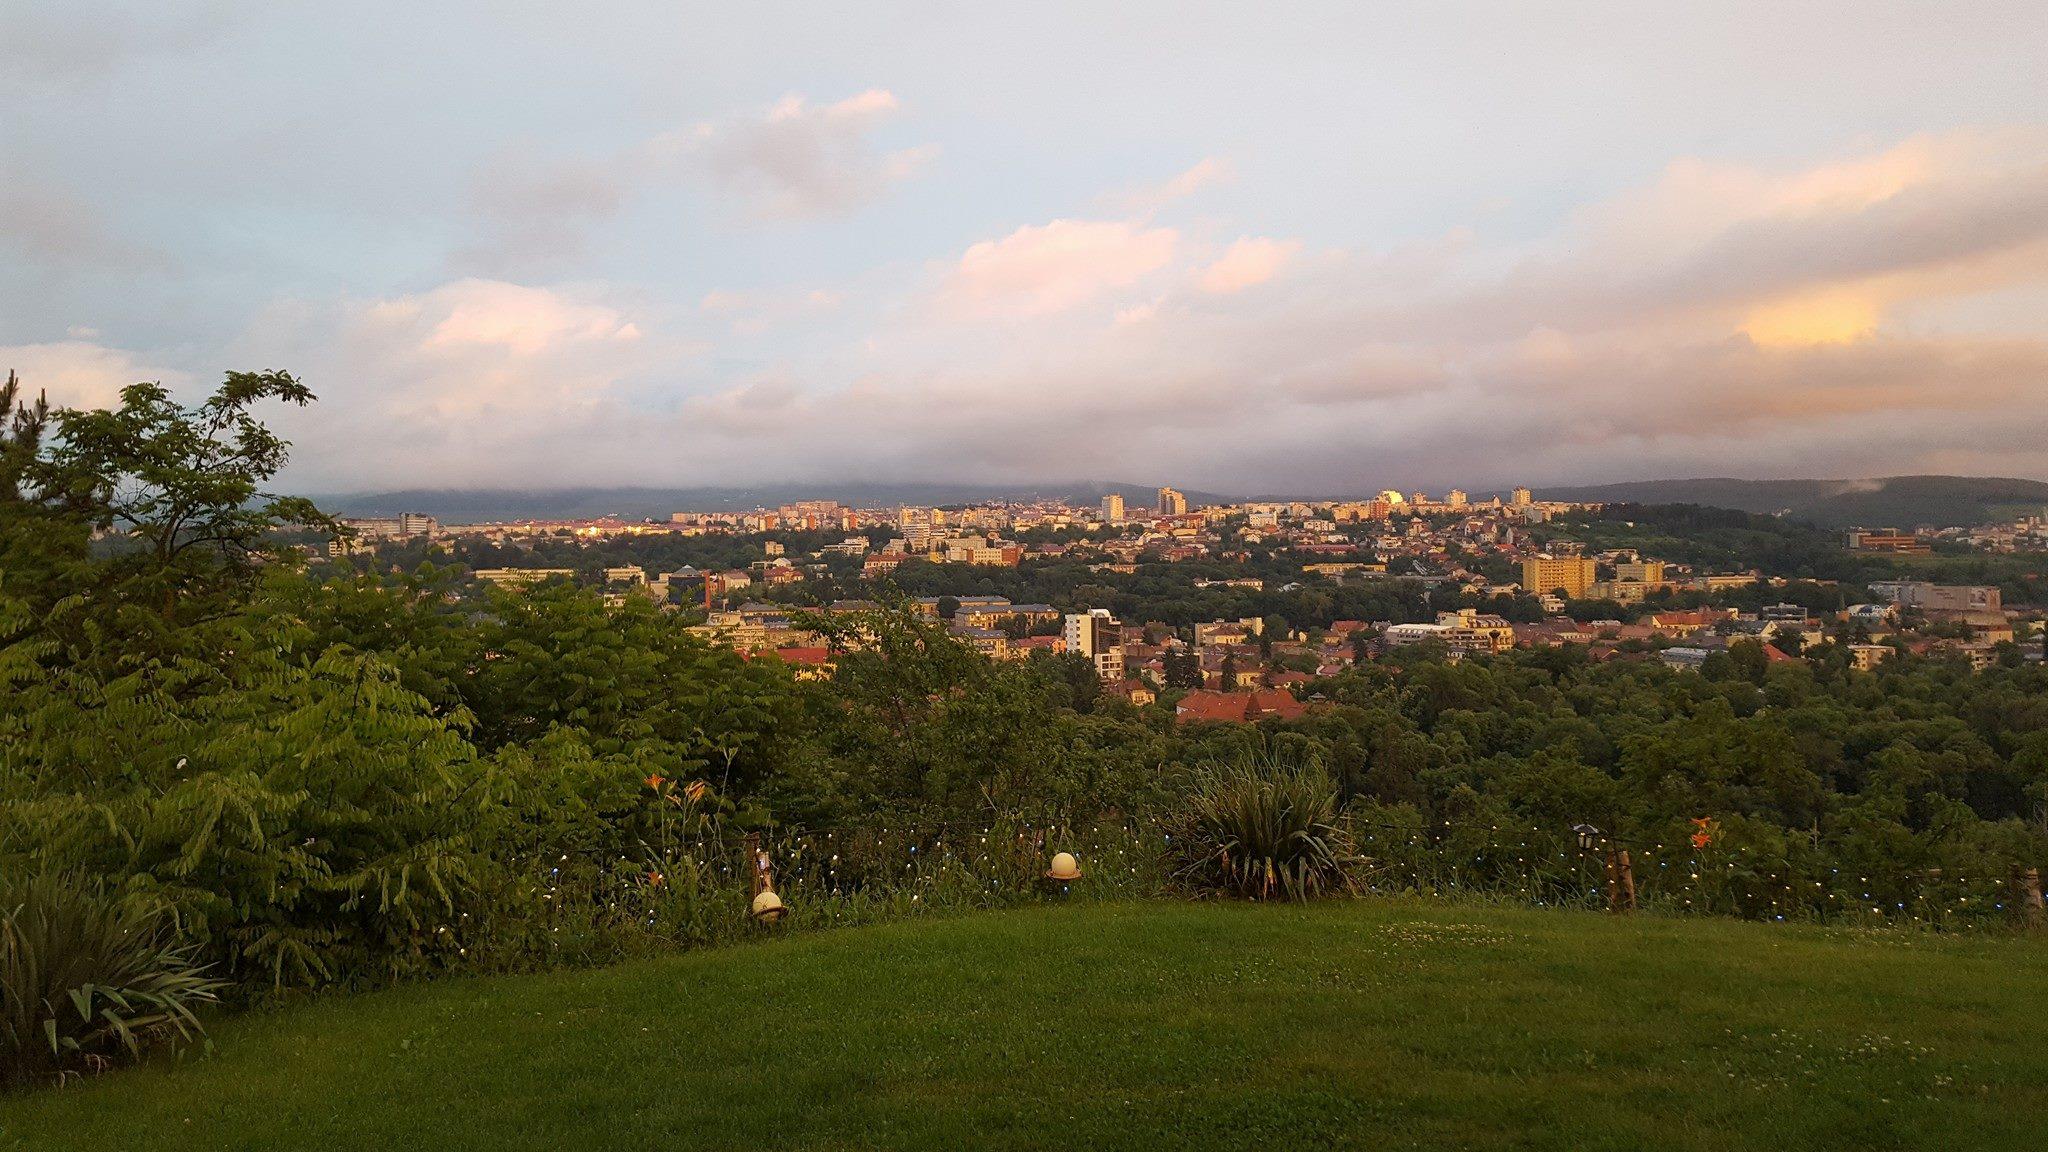 Clujul Panoramic